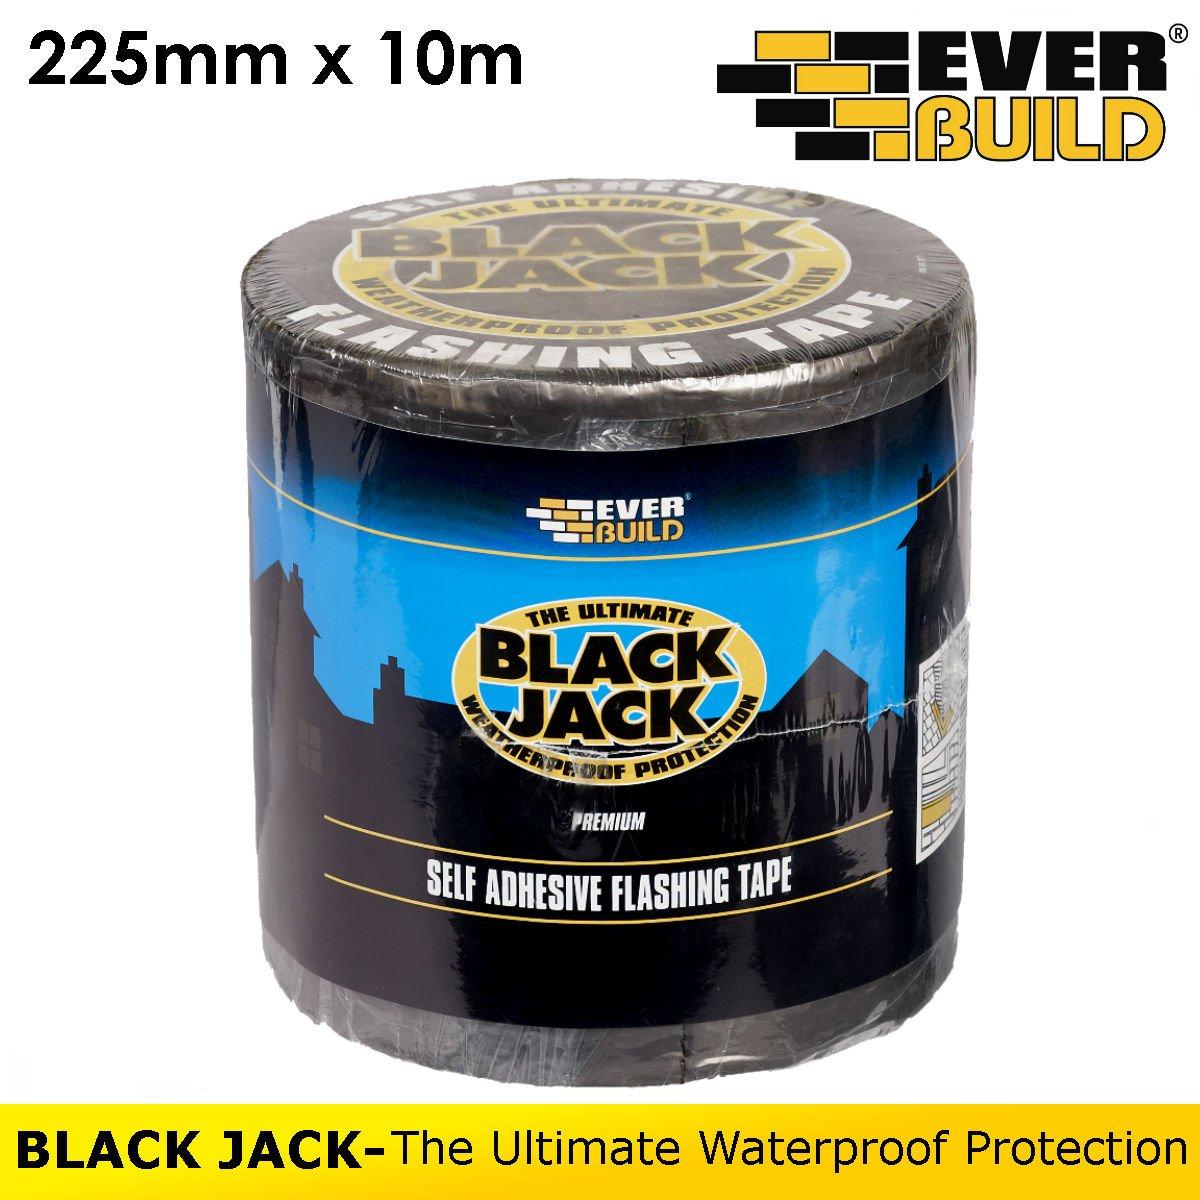 Black Jack | Flashing Tape | Self Adhesive | By Everbuild | 225mm x 10m